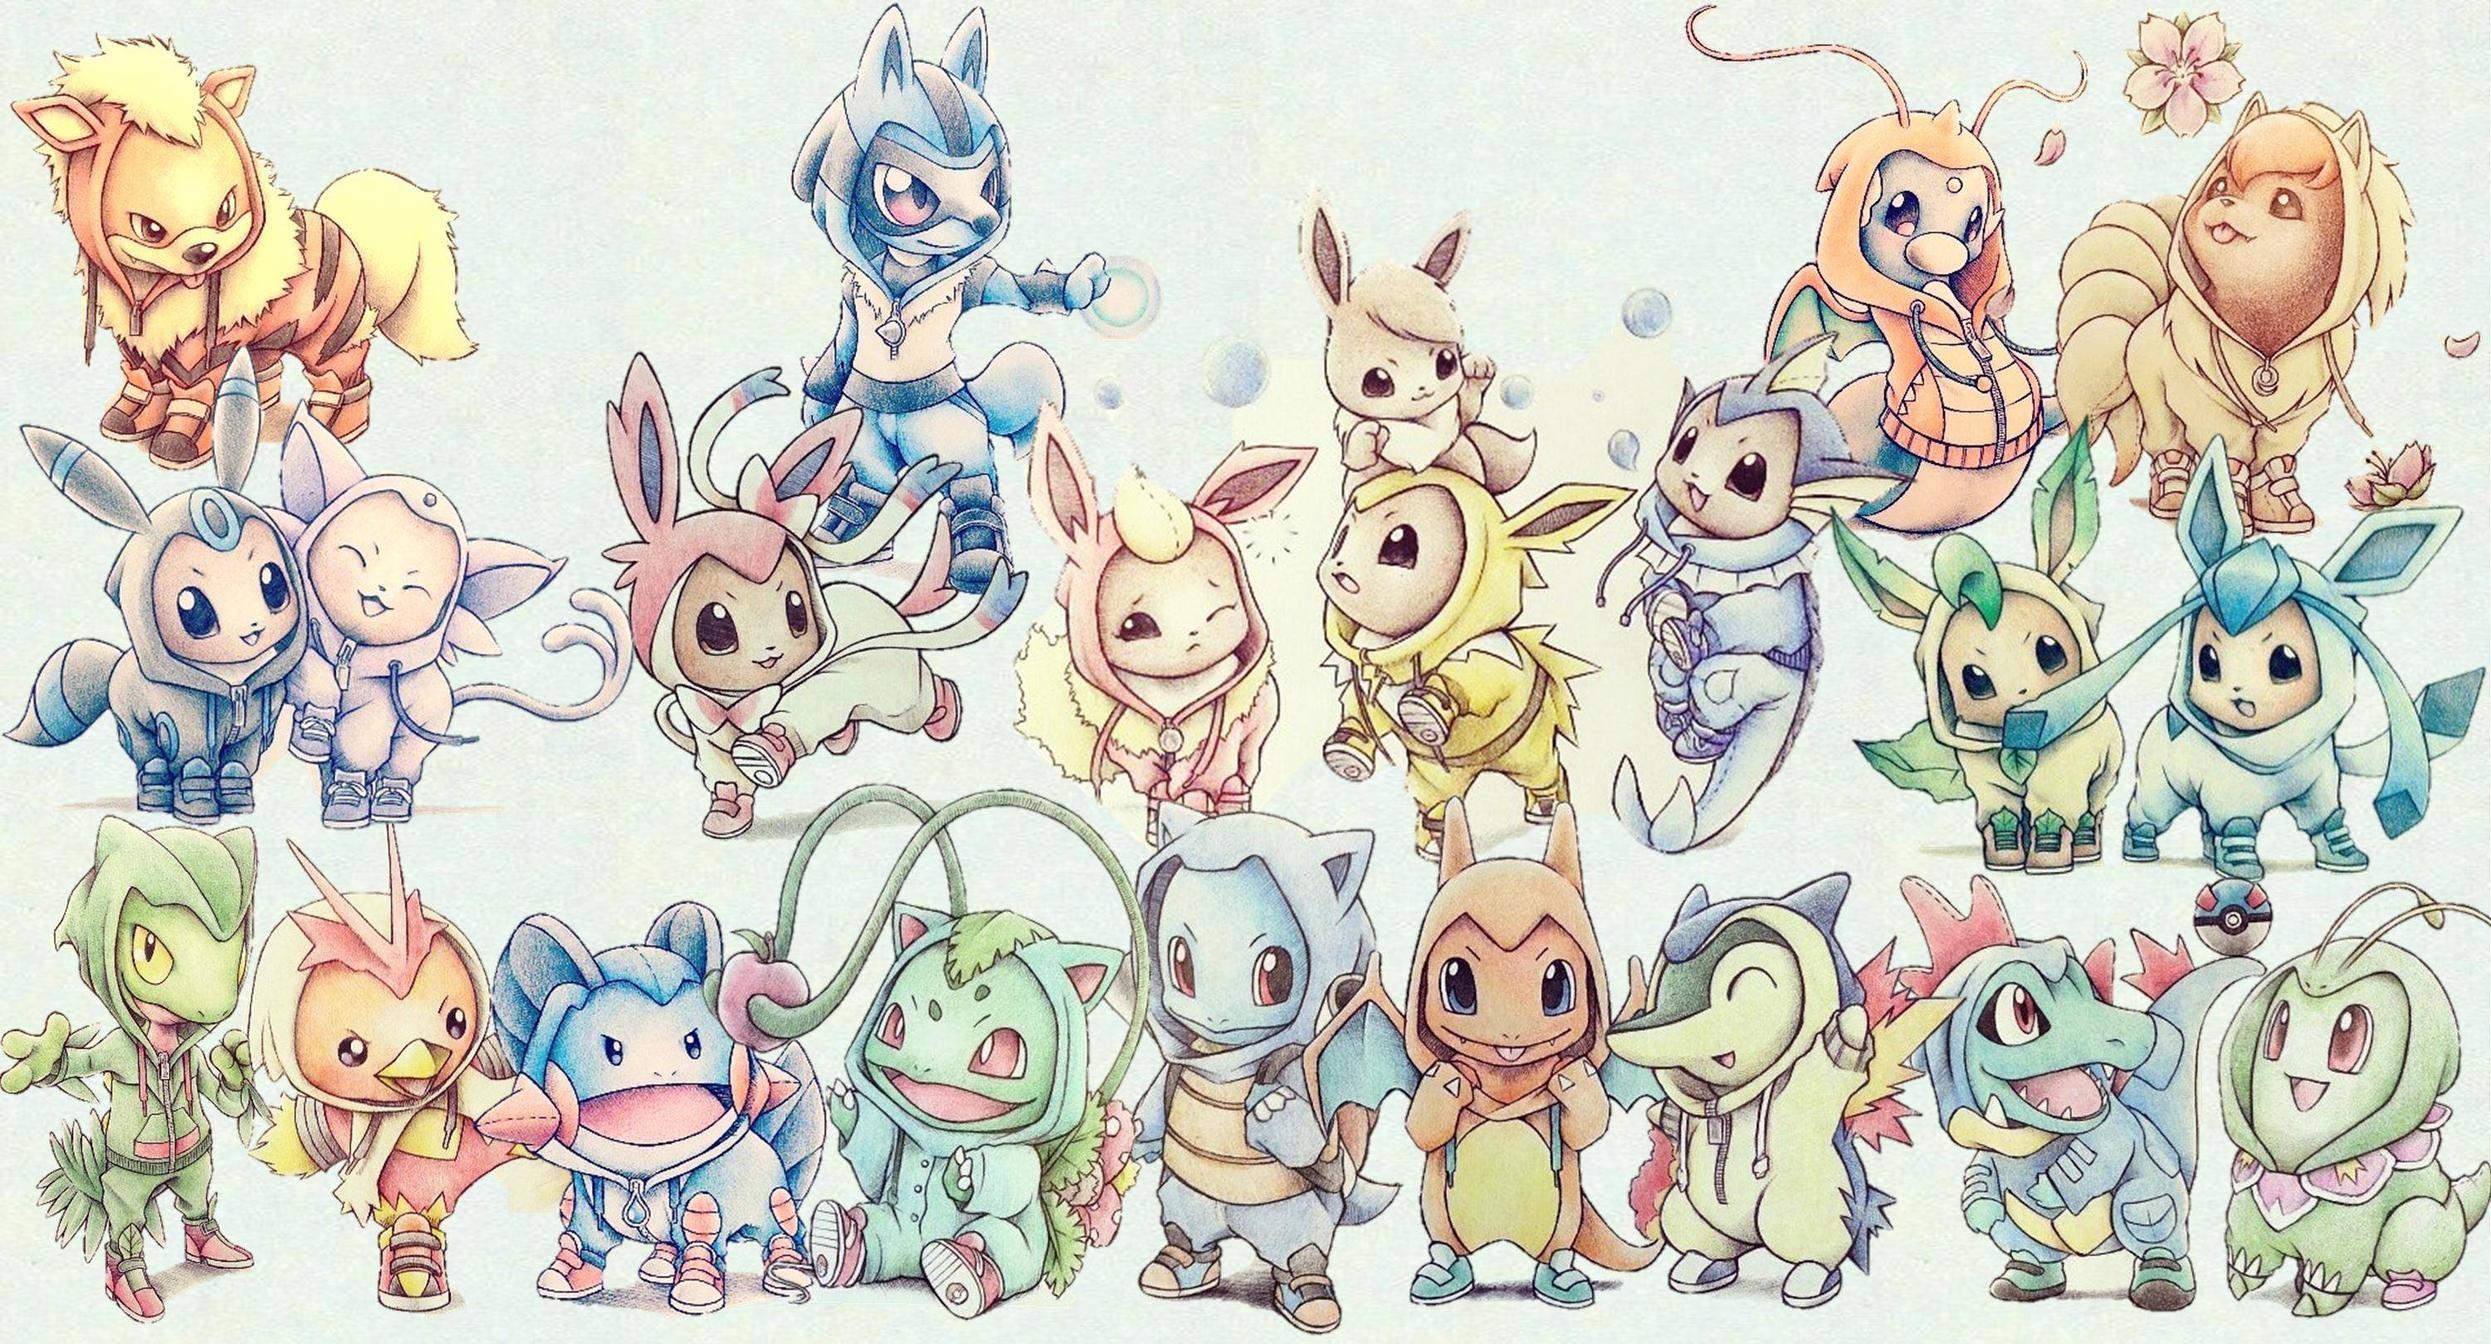 Cute Pokemon Wallpaper Background As Wallpaper HD